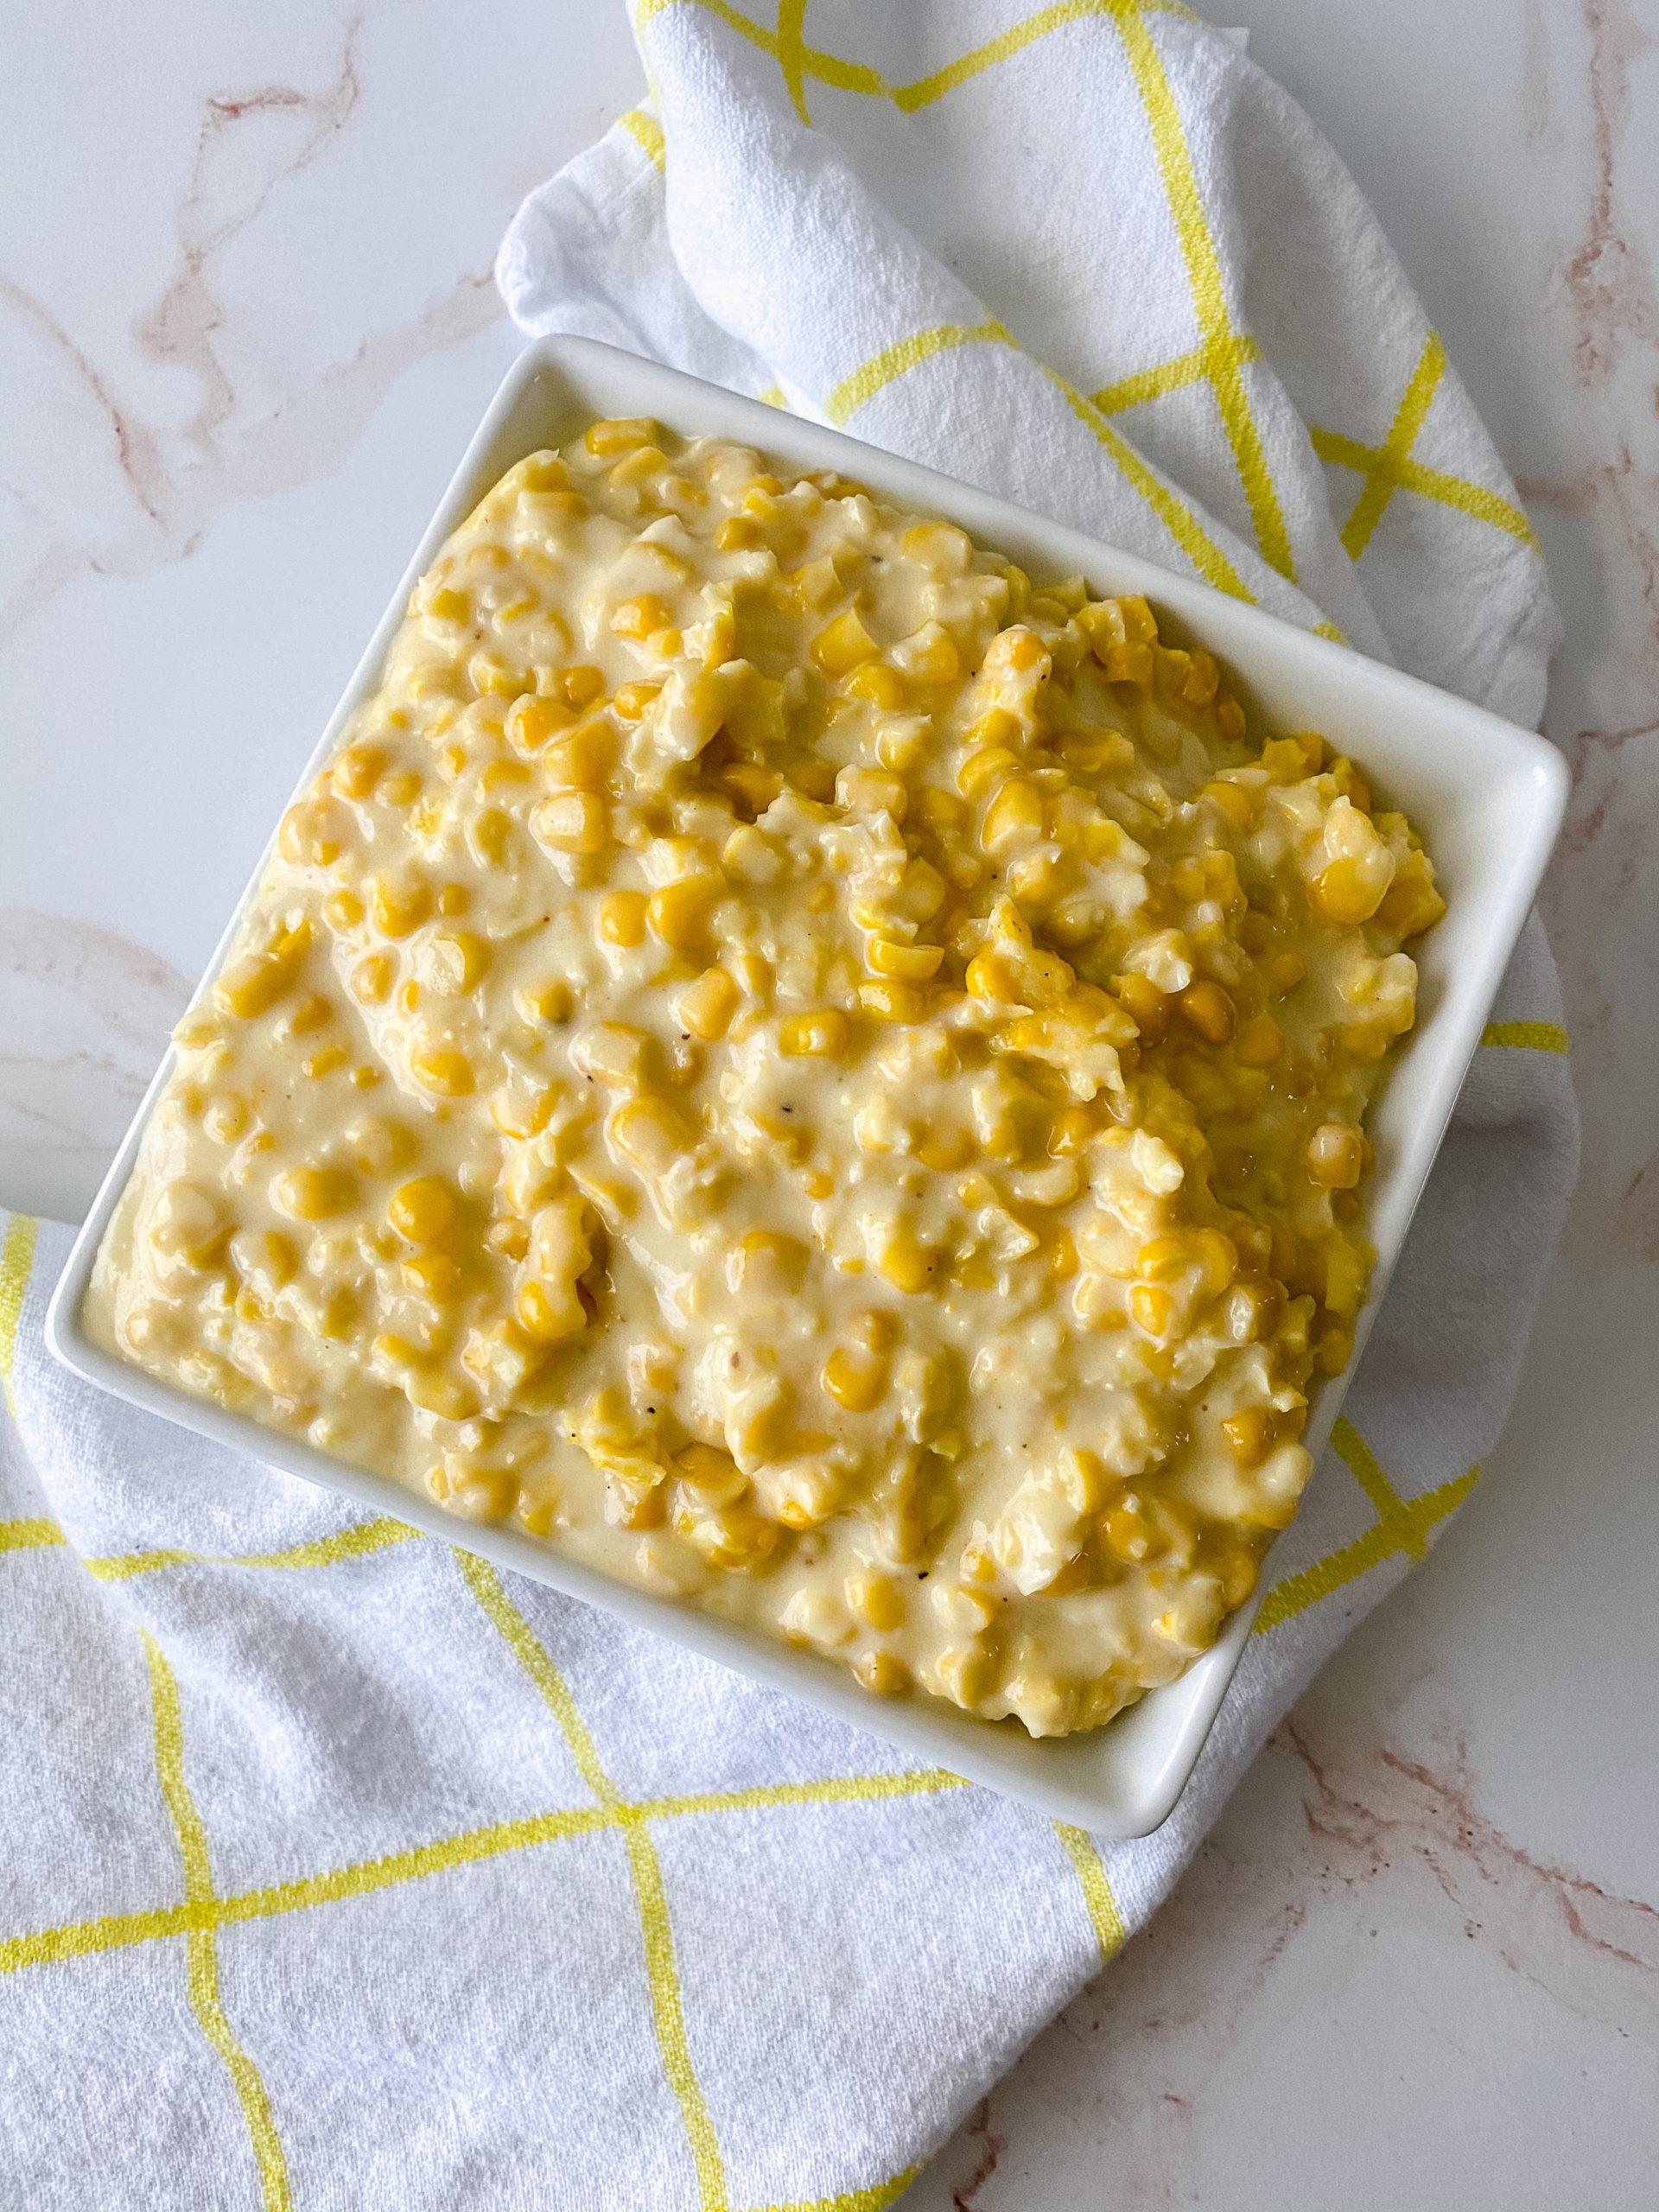 Close up of a square white dish of cream style corn.